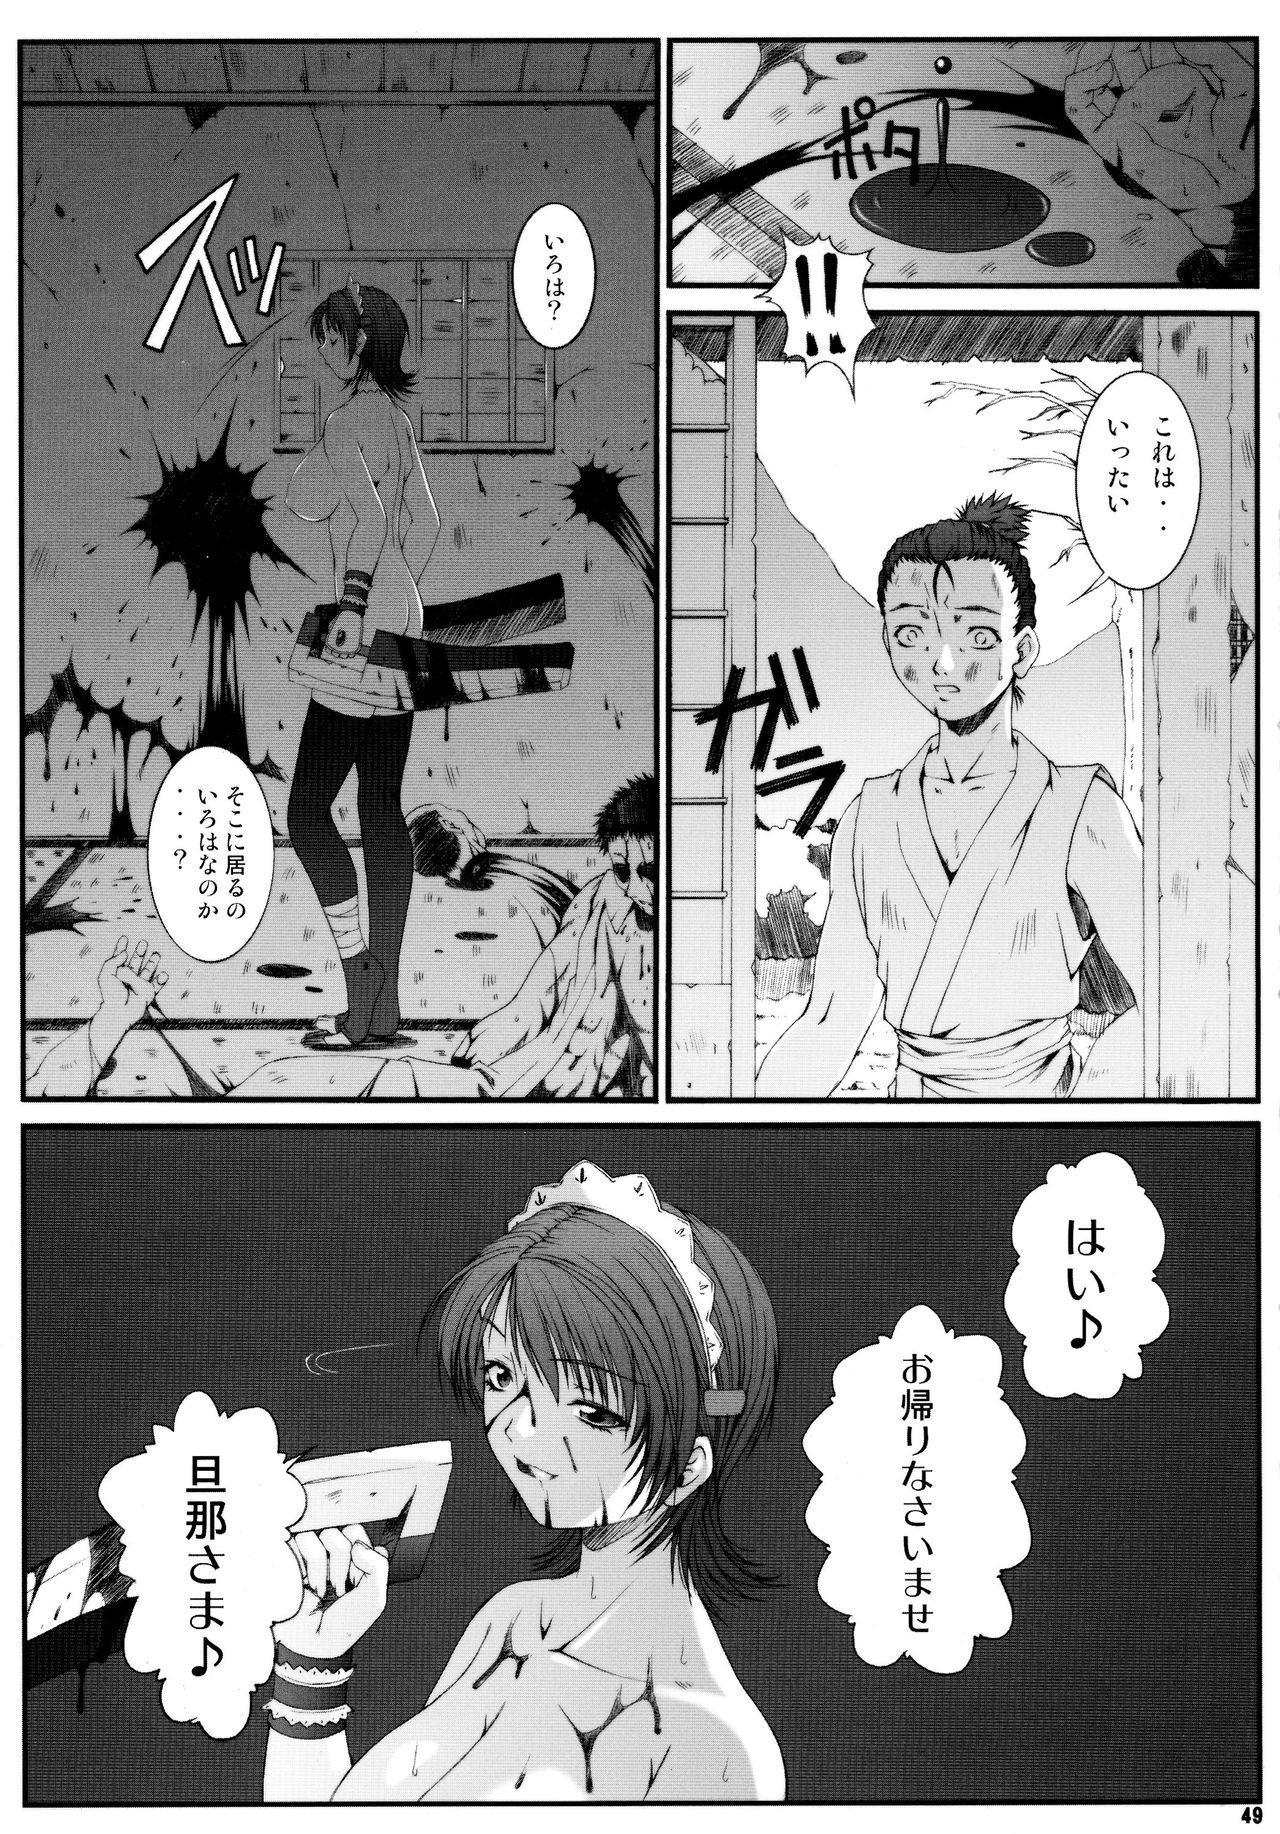 Misoka no 5 48